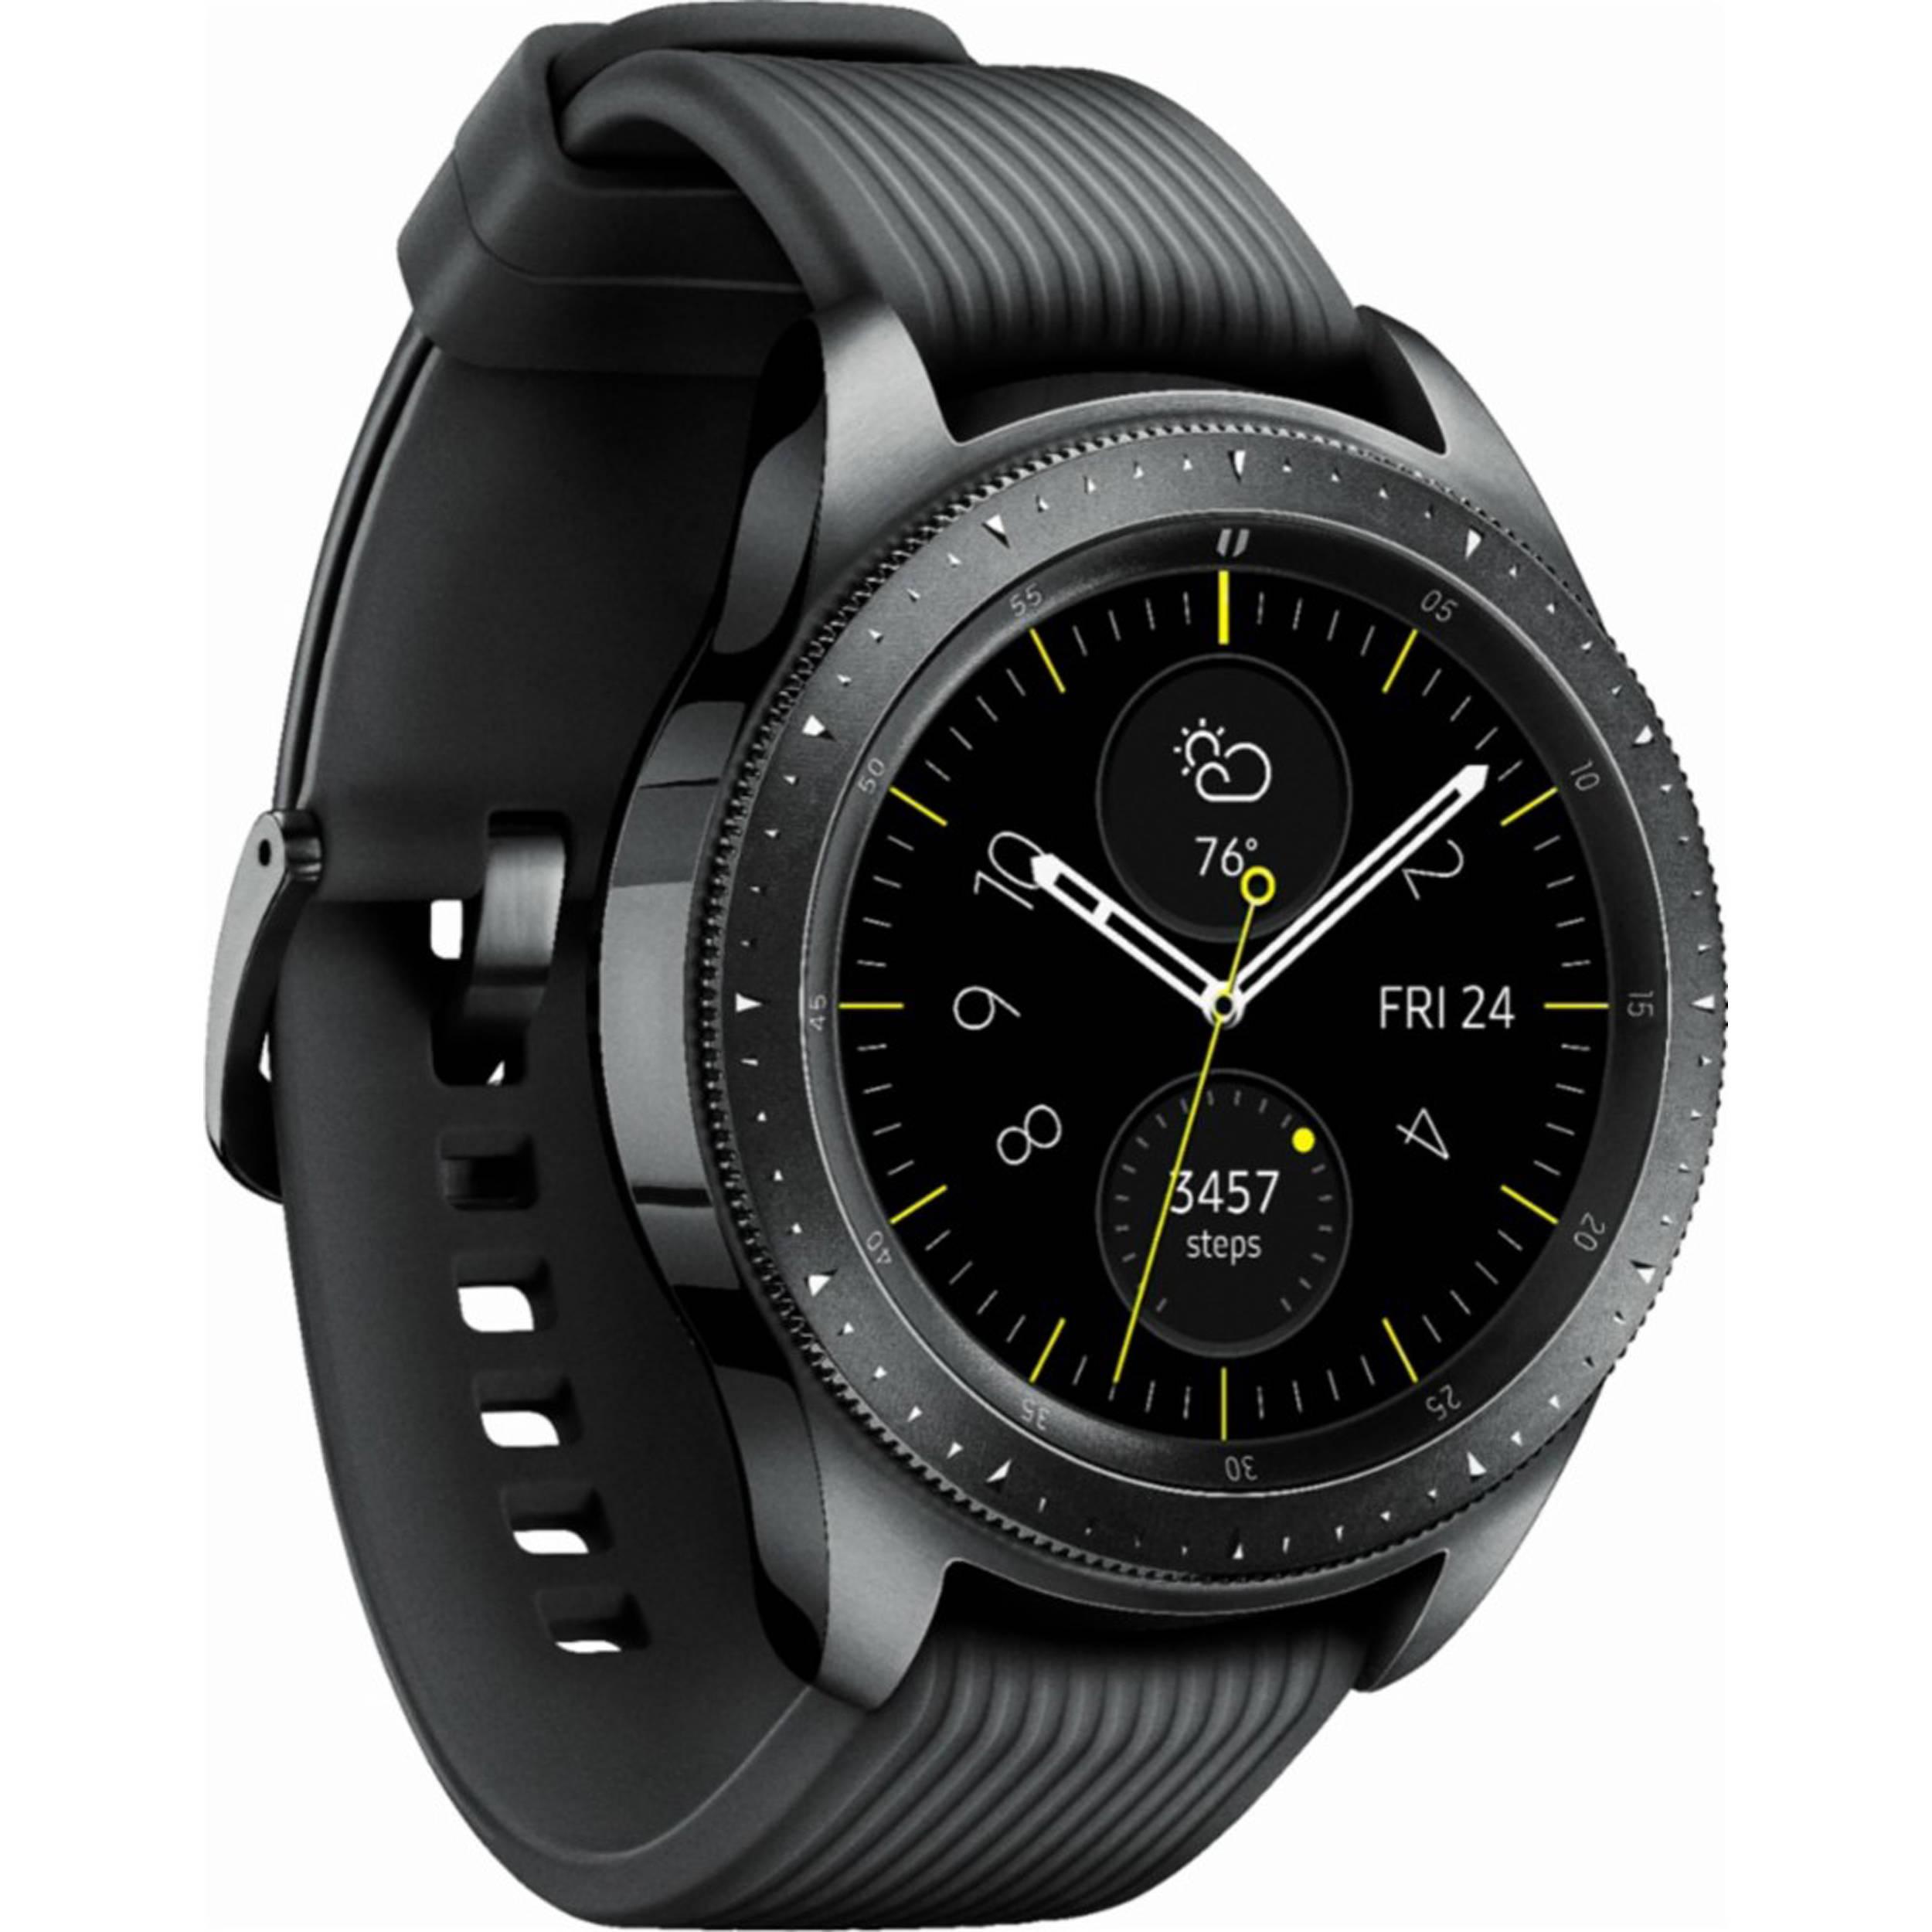 Samsung Galaxy Watch (42mm, GPS, Bluetooth, Unlocked LTE) – Midnight Black (US Version)